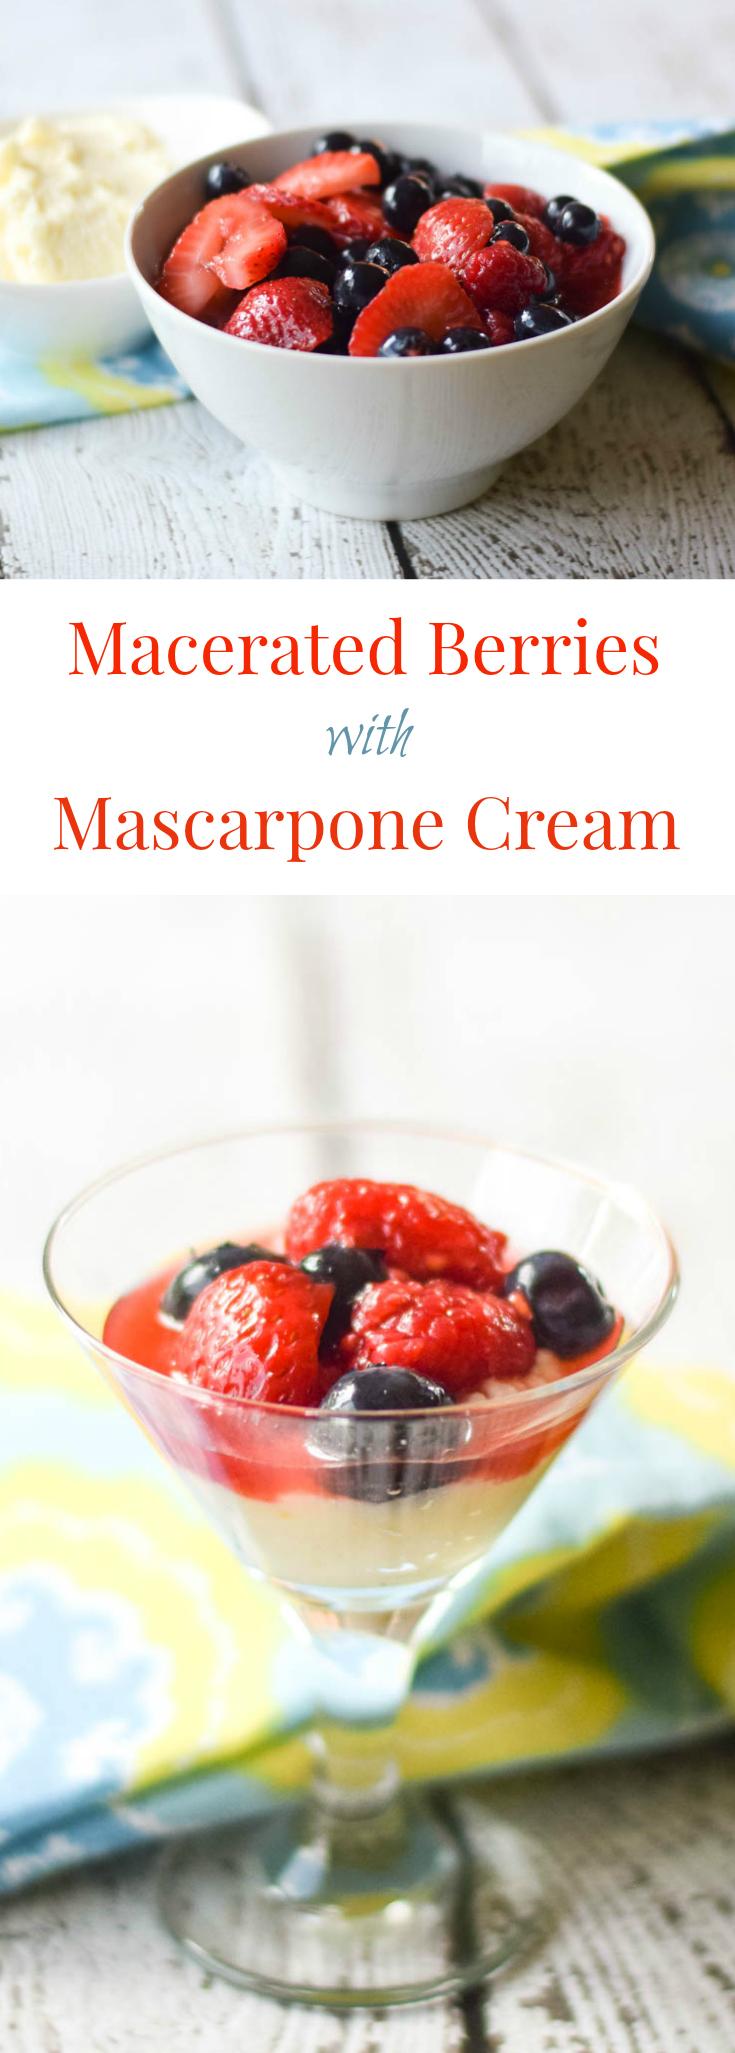 Macerated Berries with Mascarpone Cream